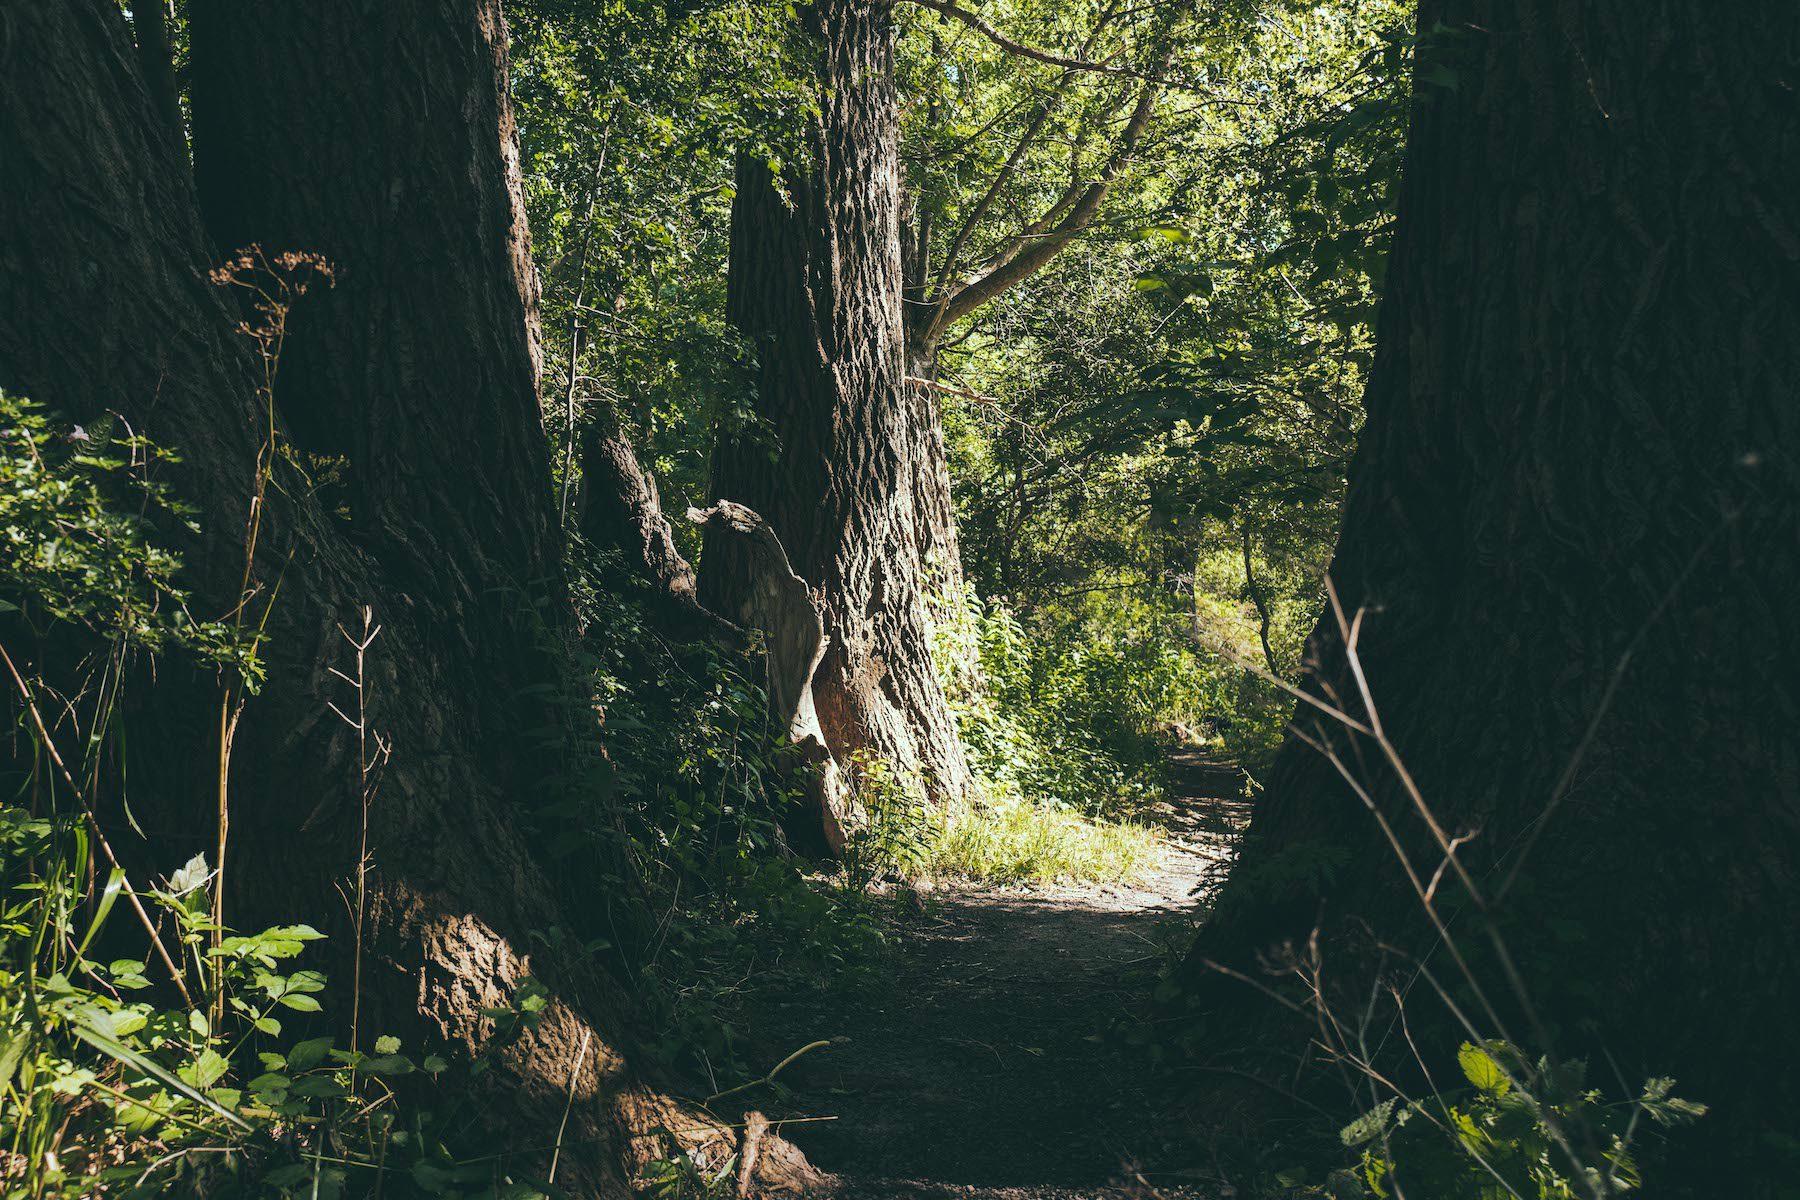 Geheimtipp Hamburg Natur & Ausflüge Wilhemsburg Naturschutzgebiet Heuckenlock Cristina Lopez 1